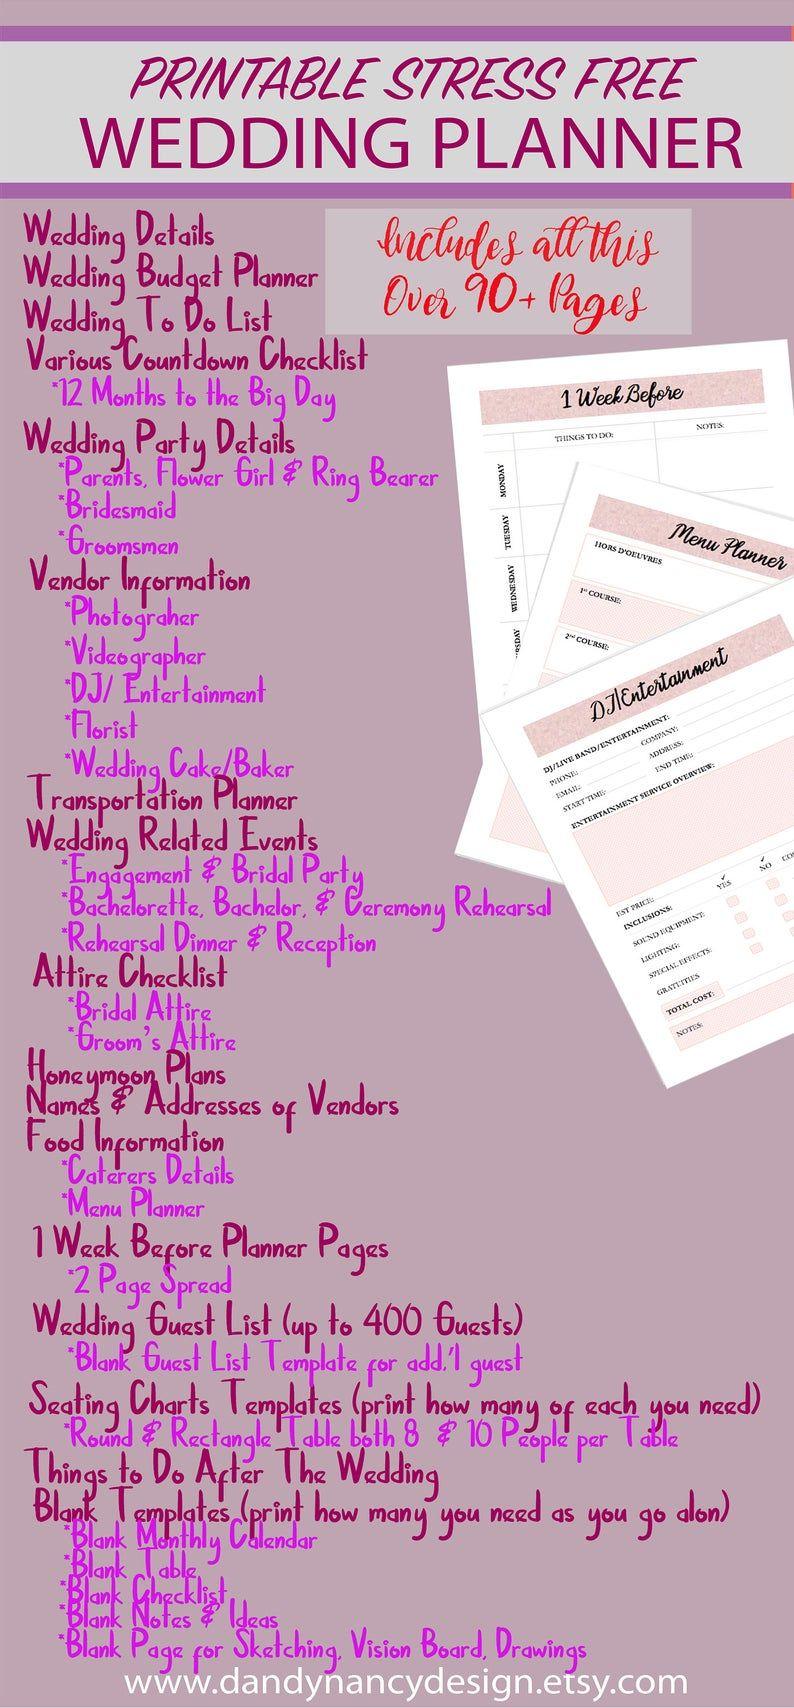 Pin By Dandy Nancy Design On My Wedding Ideas In 2020 Free Wedding Planner Wedding Planner Printables Wedding Planning Binder